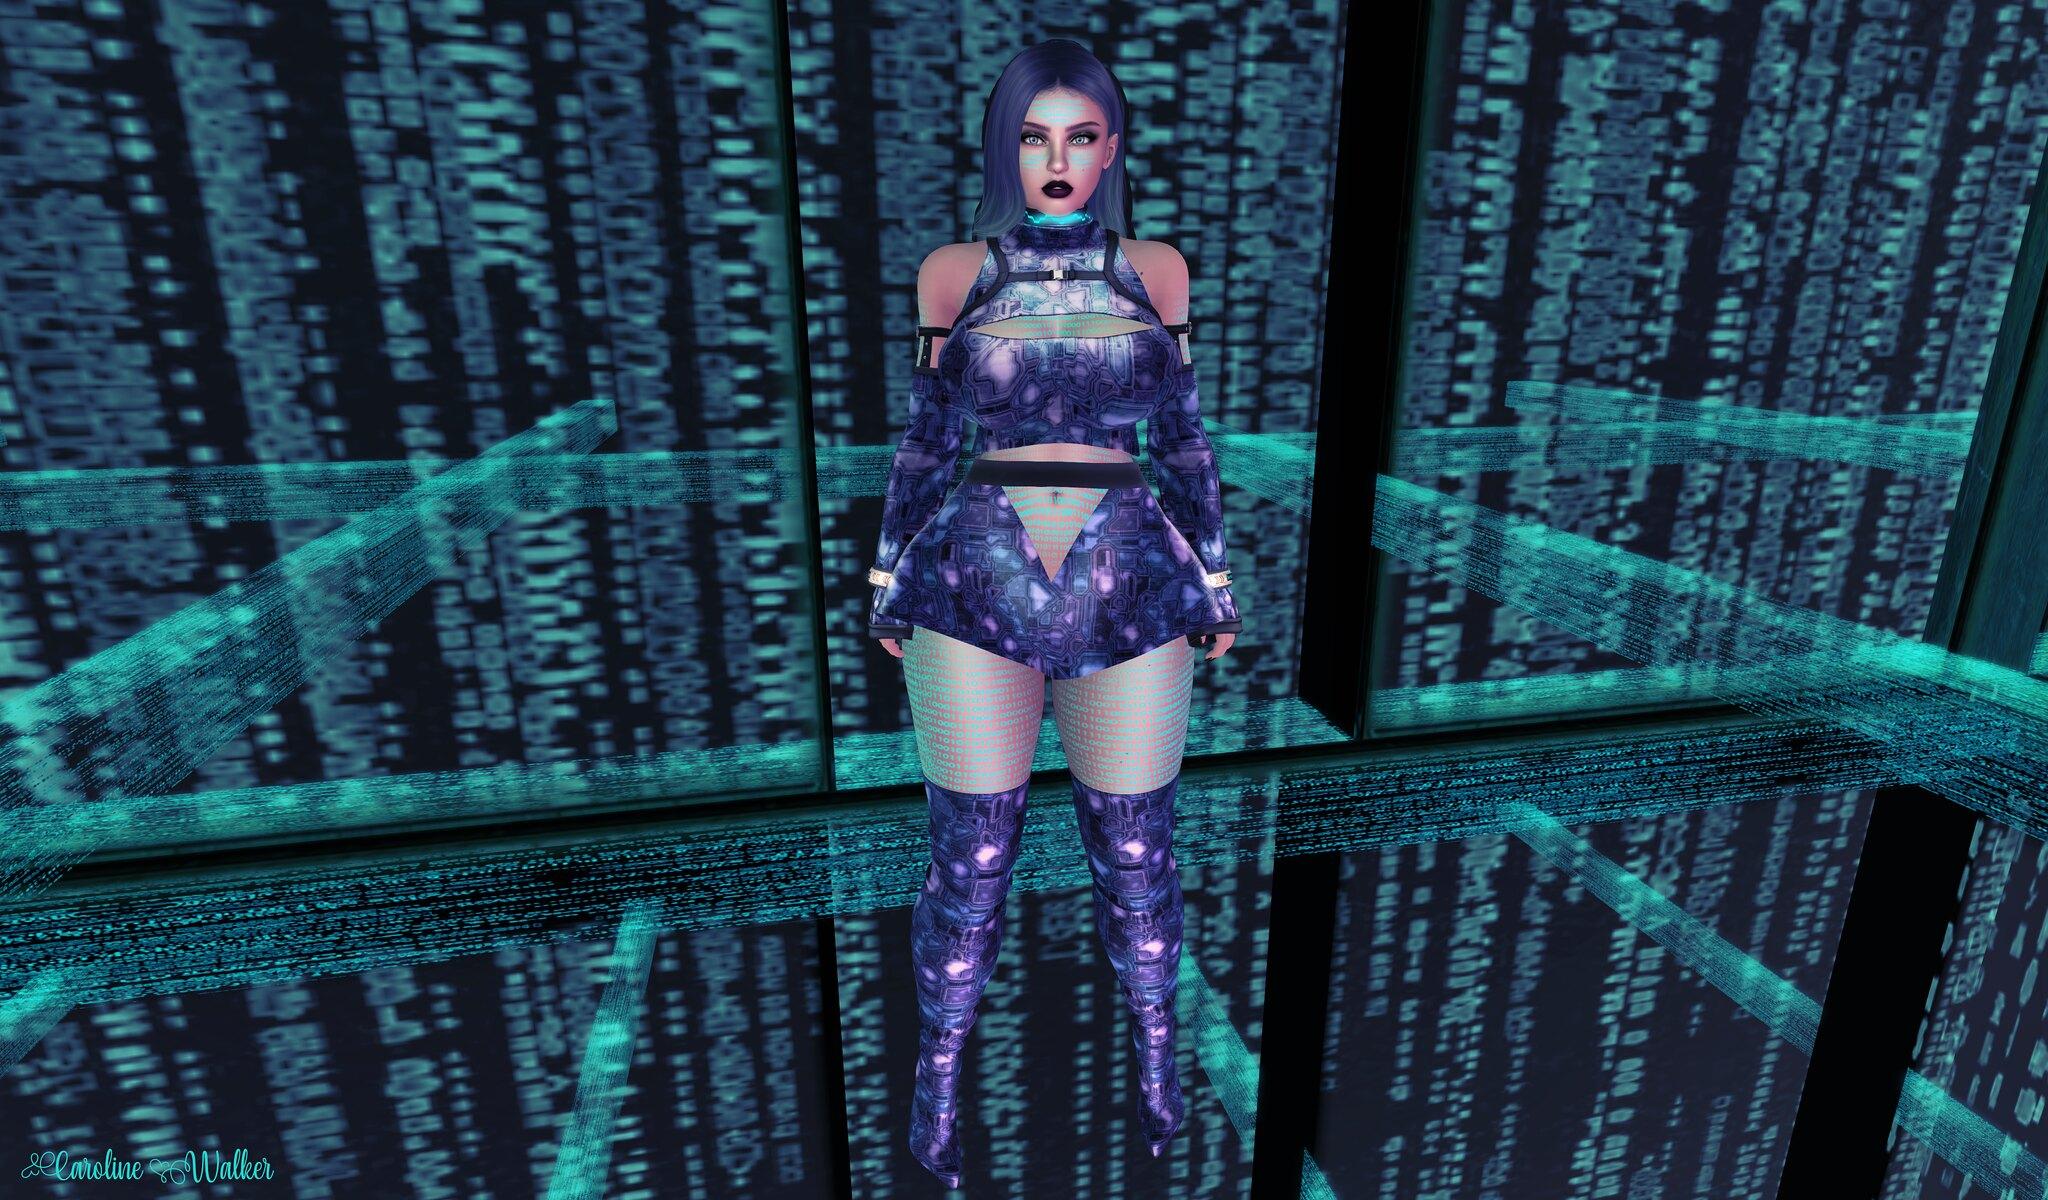 Cyberpunk'd 1